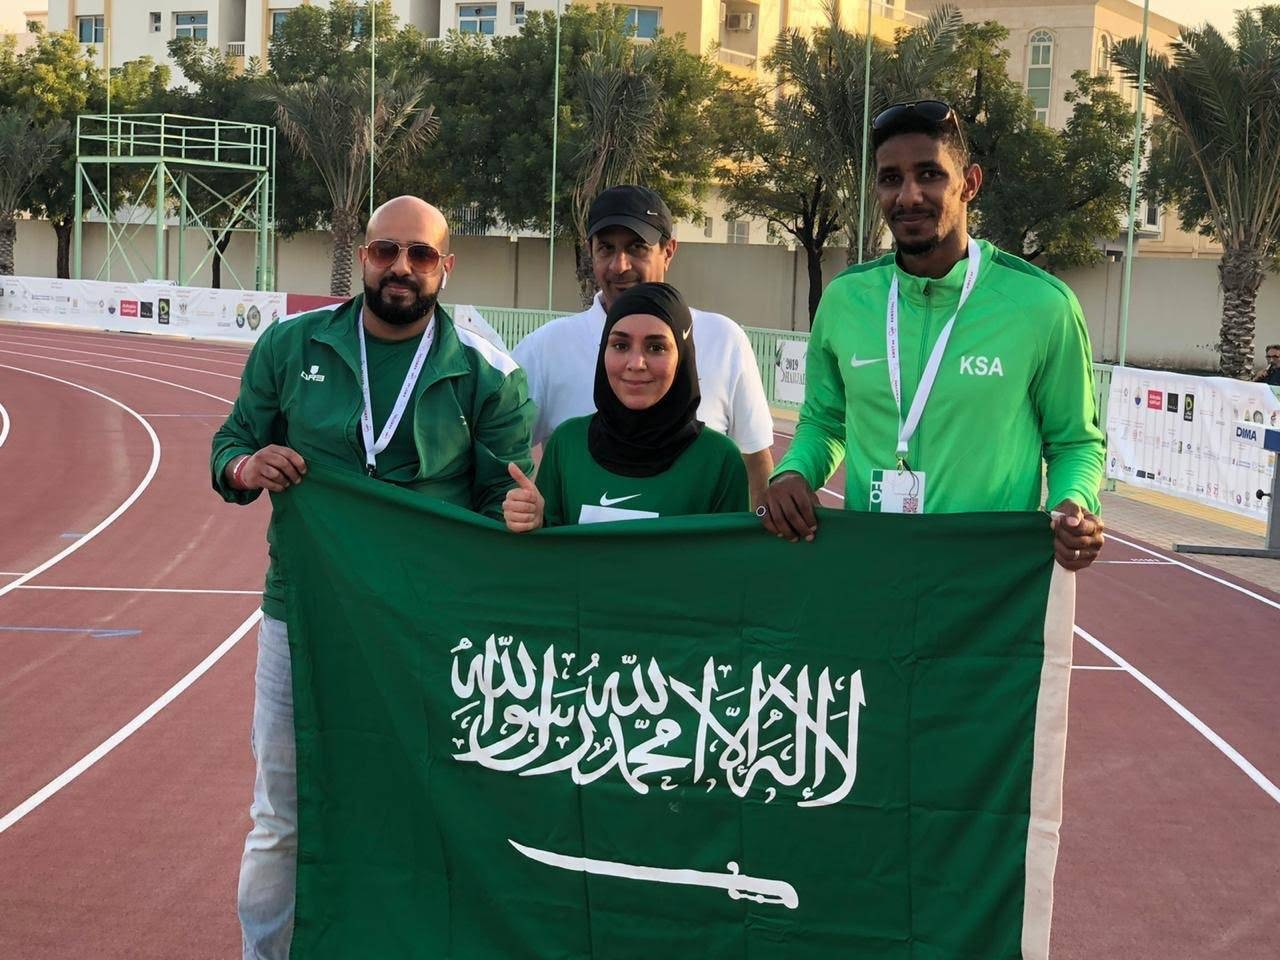 Nada Abed, Fawzia Al-Khaibri, Mashael Al-Khayal and Lama Al-Fawzan.